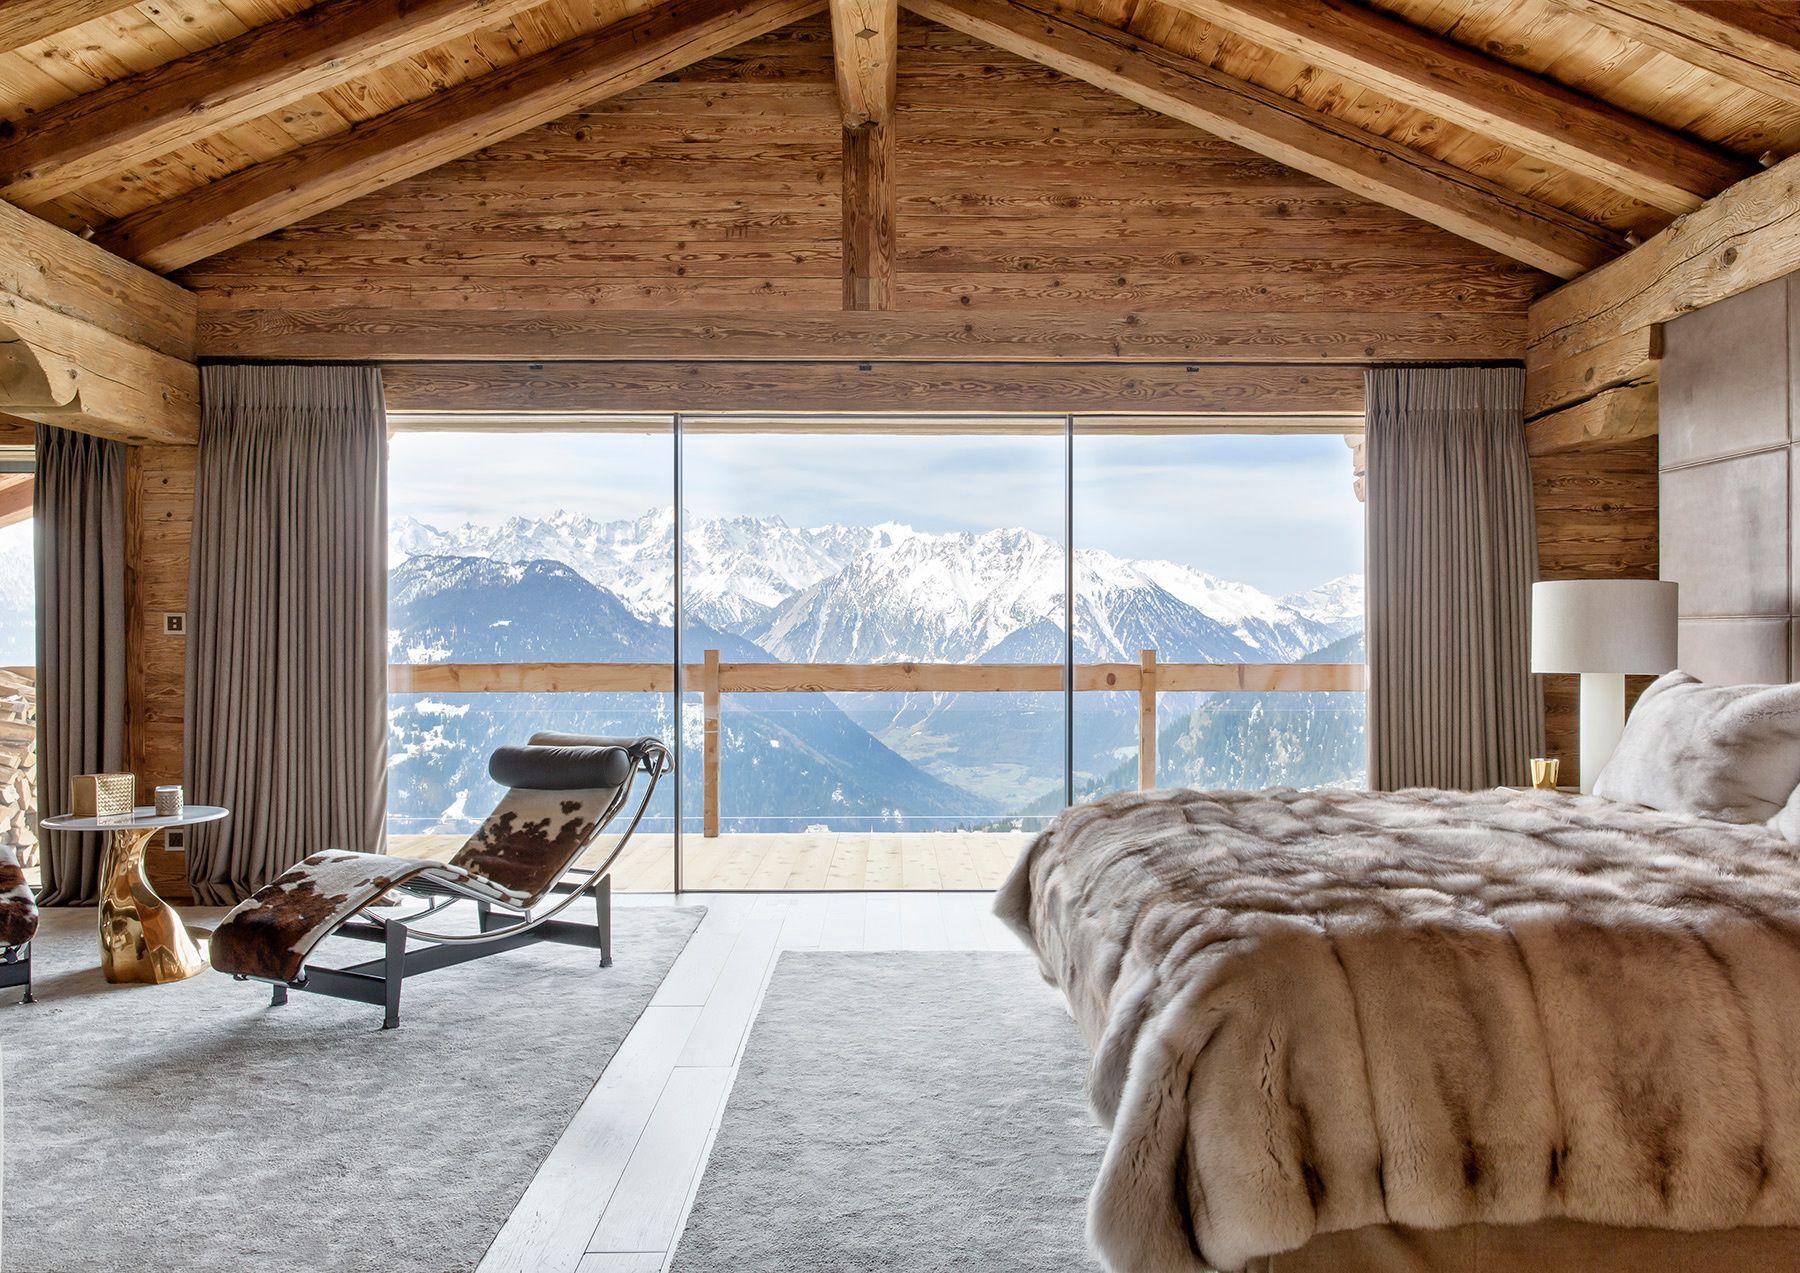 Un chalet espectacular en los alpes suizos casas espectaculares chalet casas y alpes - Casas en los alpes suizos ...